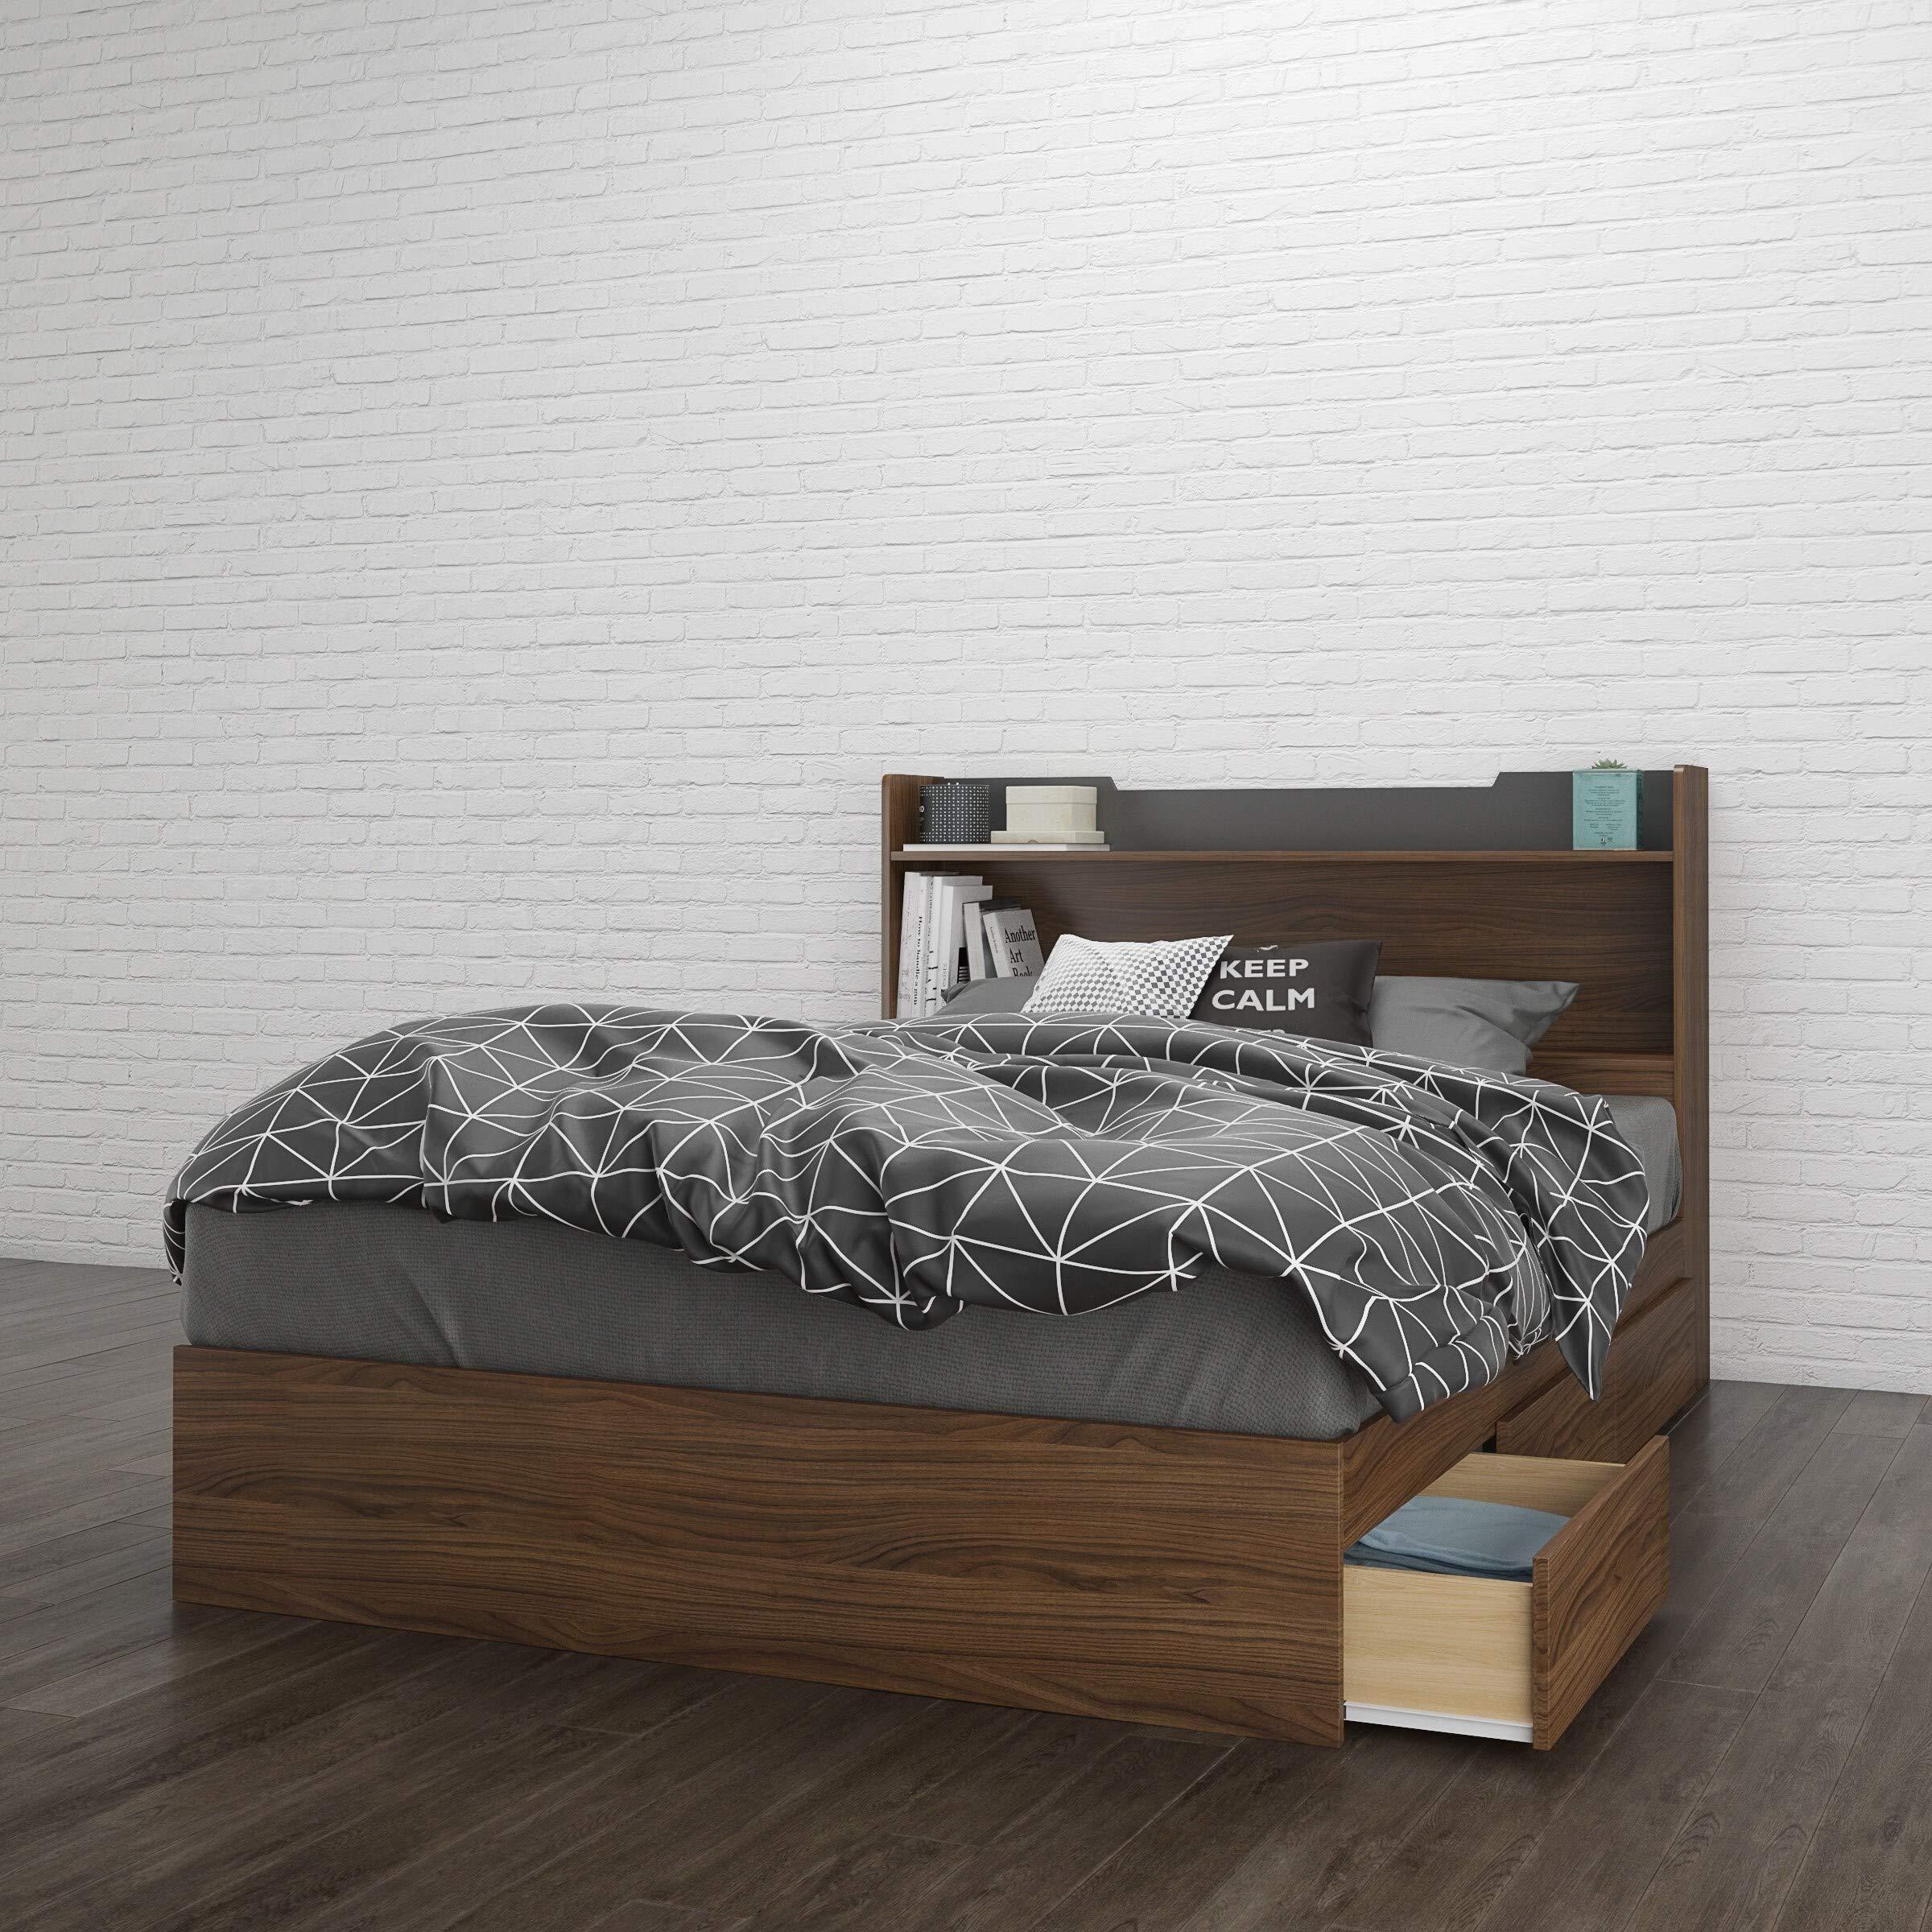 Nexera Cartel 3 Drawer Full Size Bed Bundle #400951 Walnut/Charcoal